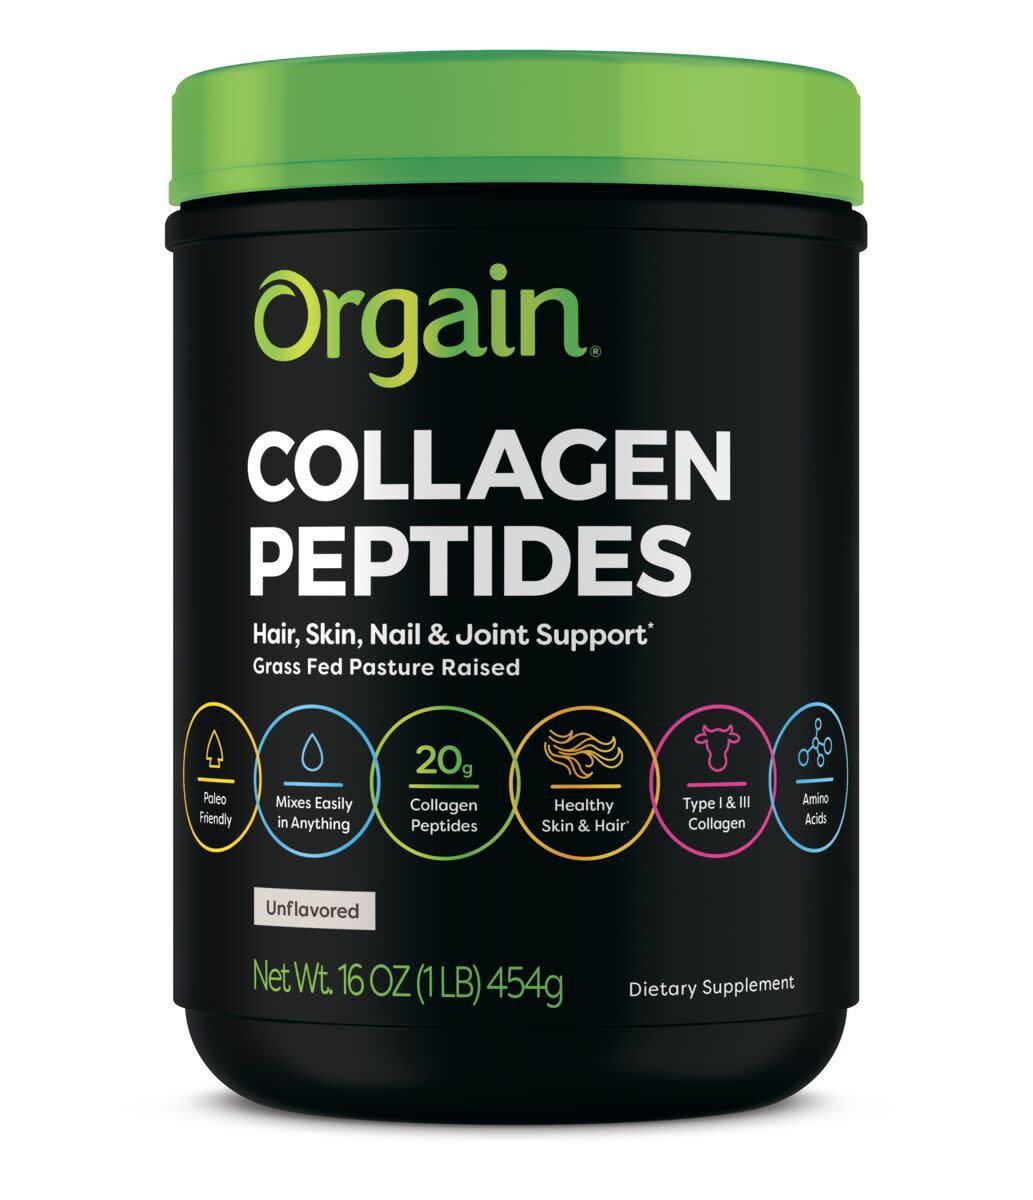 Orgain Grass-Fed Pasture Raised Collagen Peptides Powder, Unflavored, 16 Oz